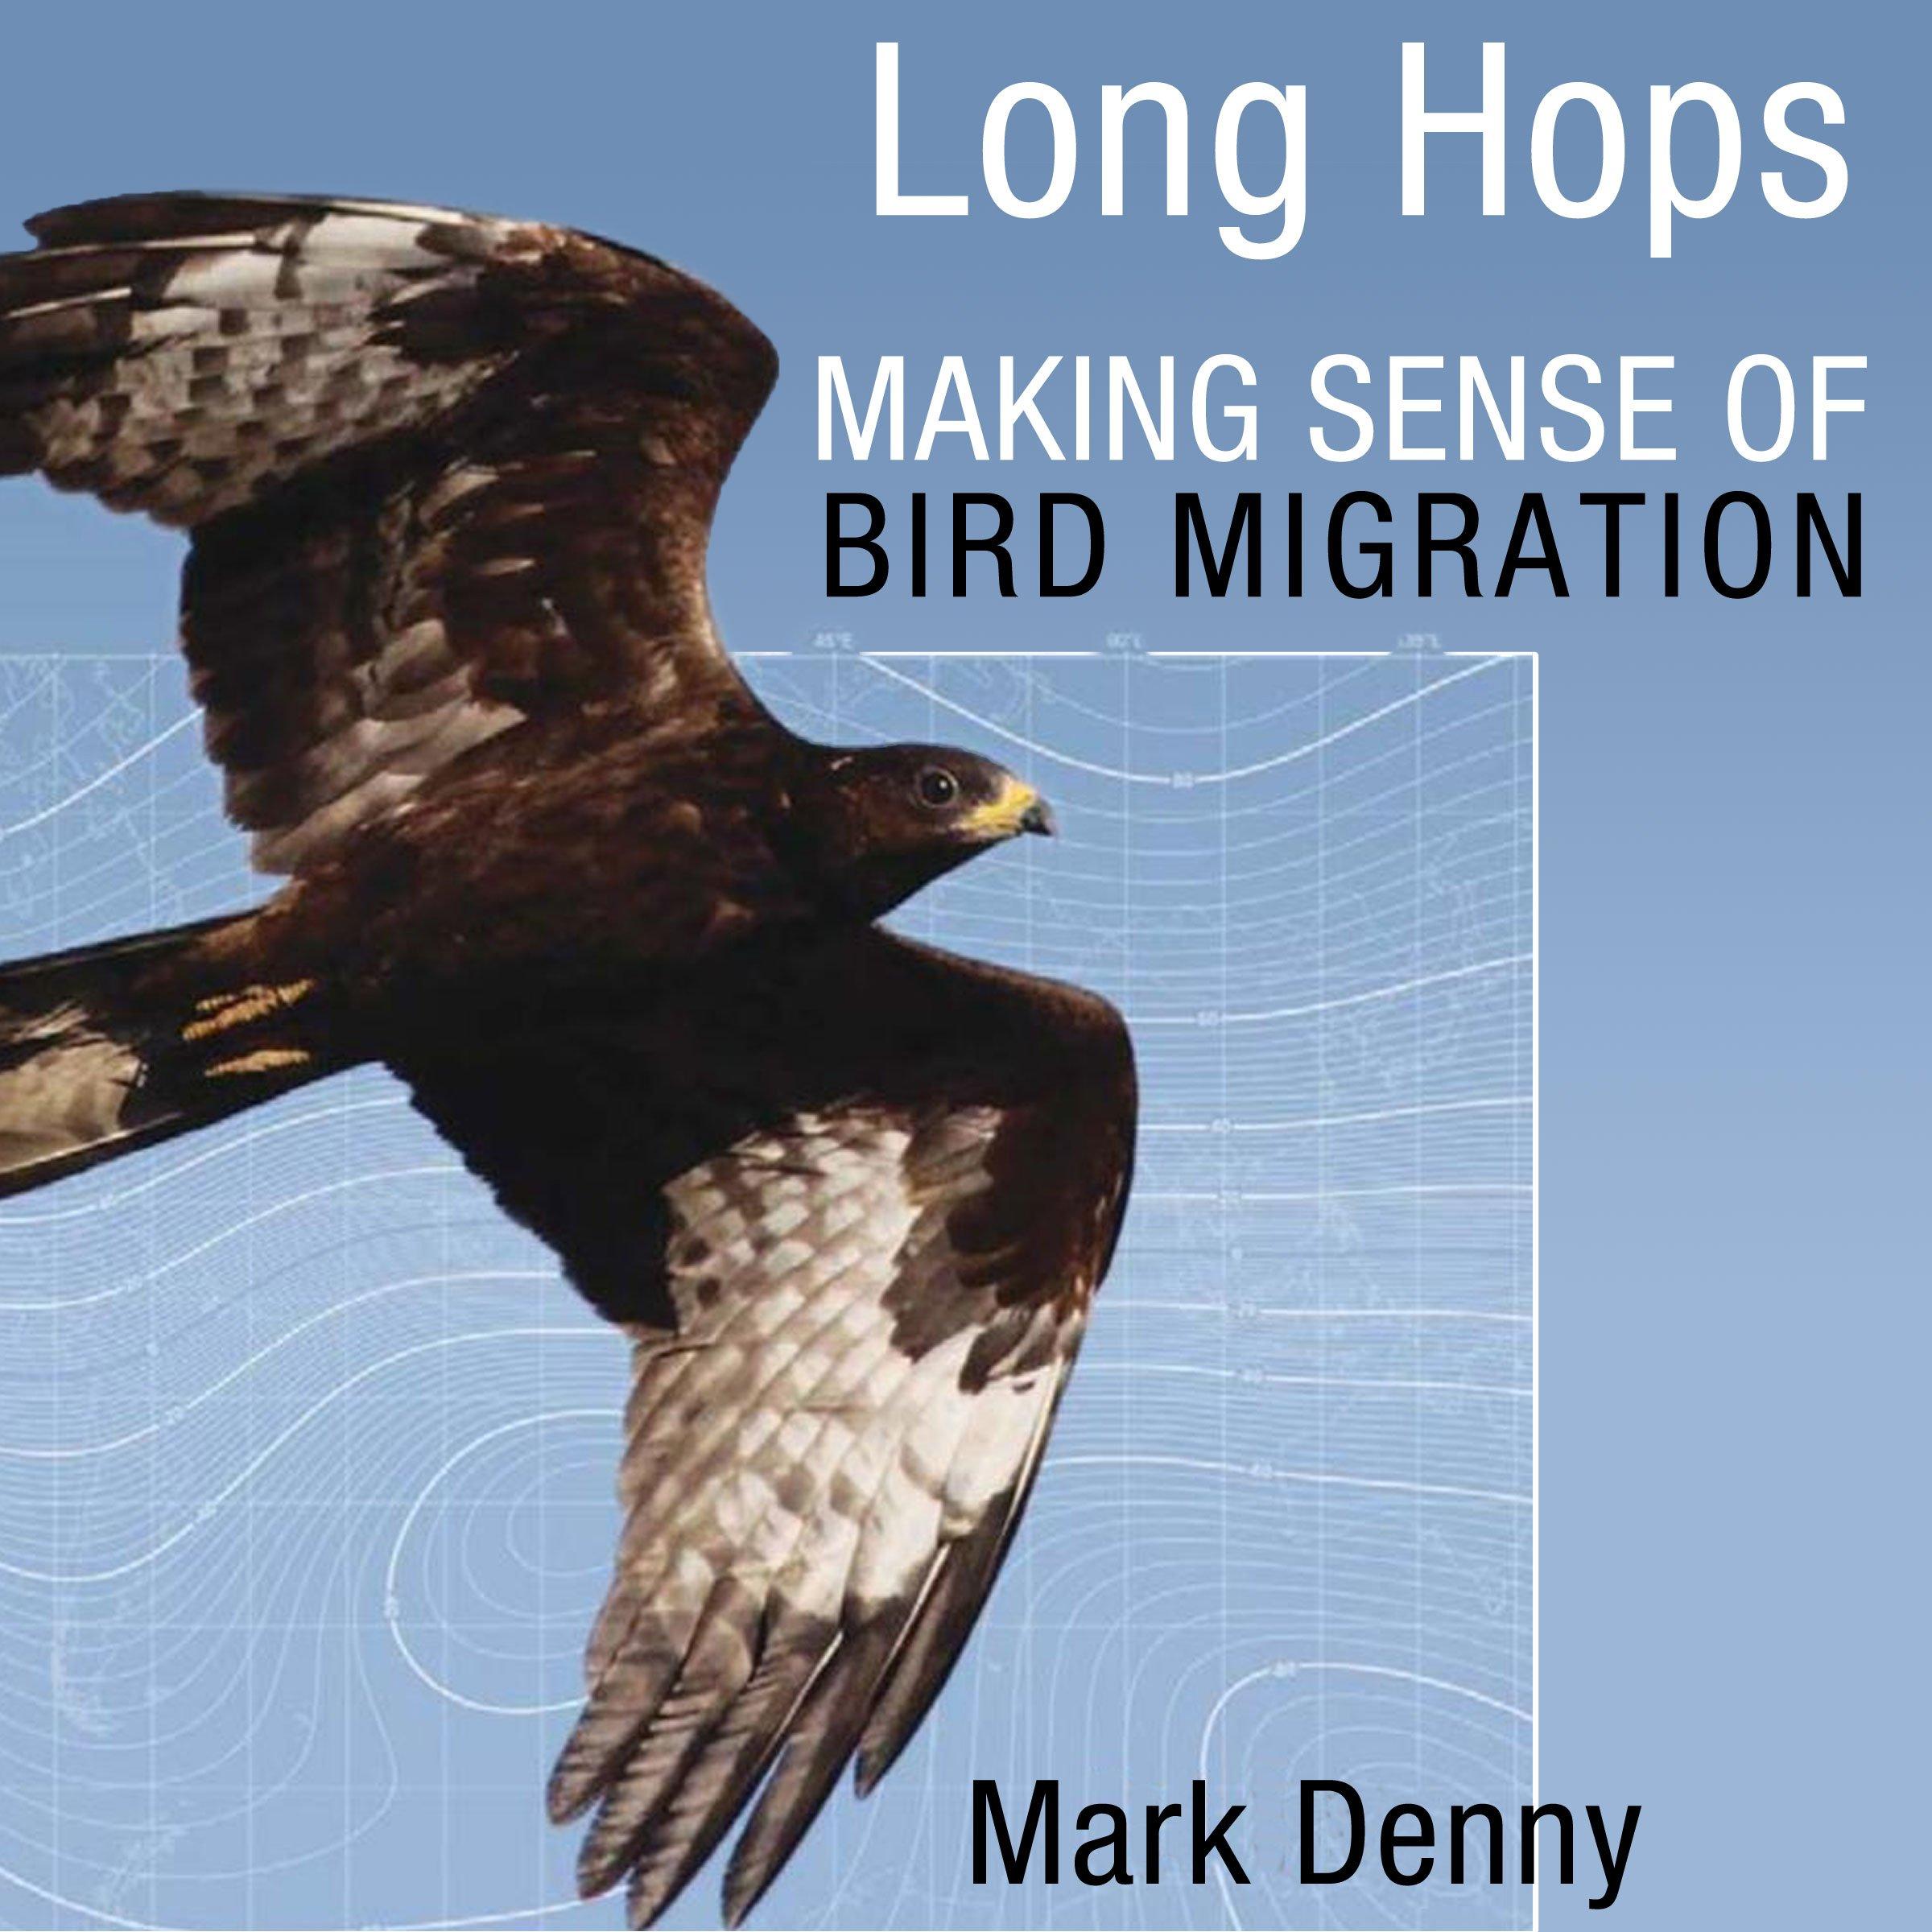 Long Hops: Making Sense of Bird Migration: Latitude 20 Book